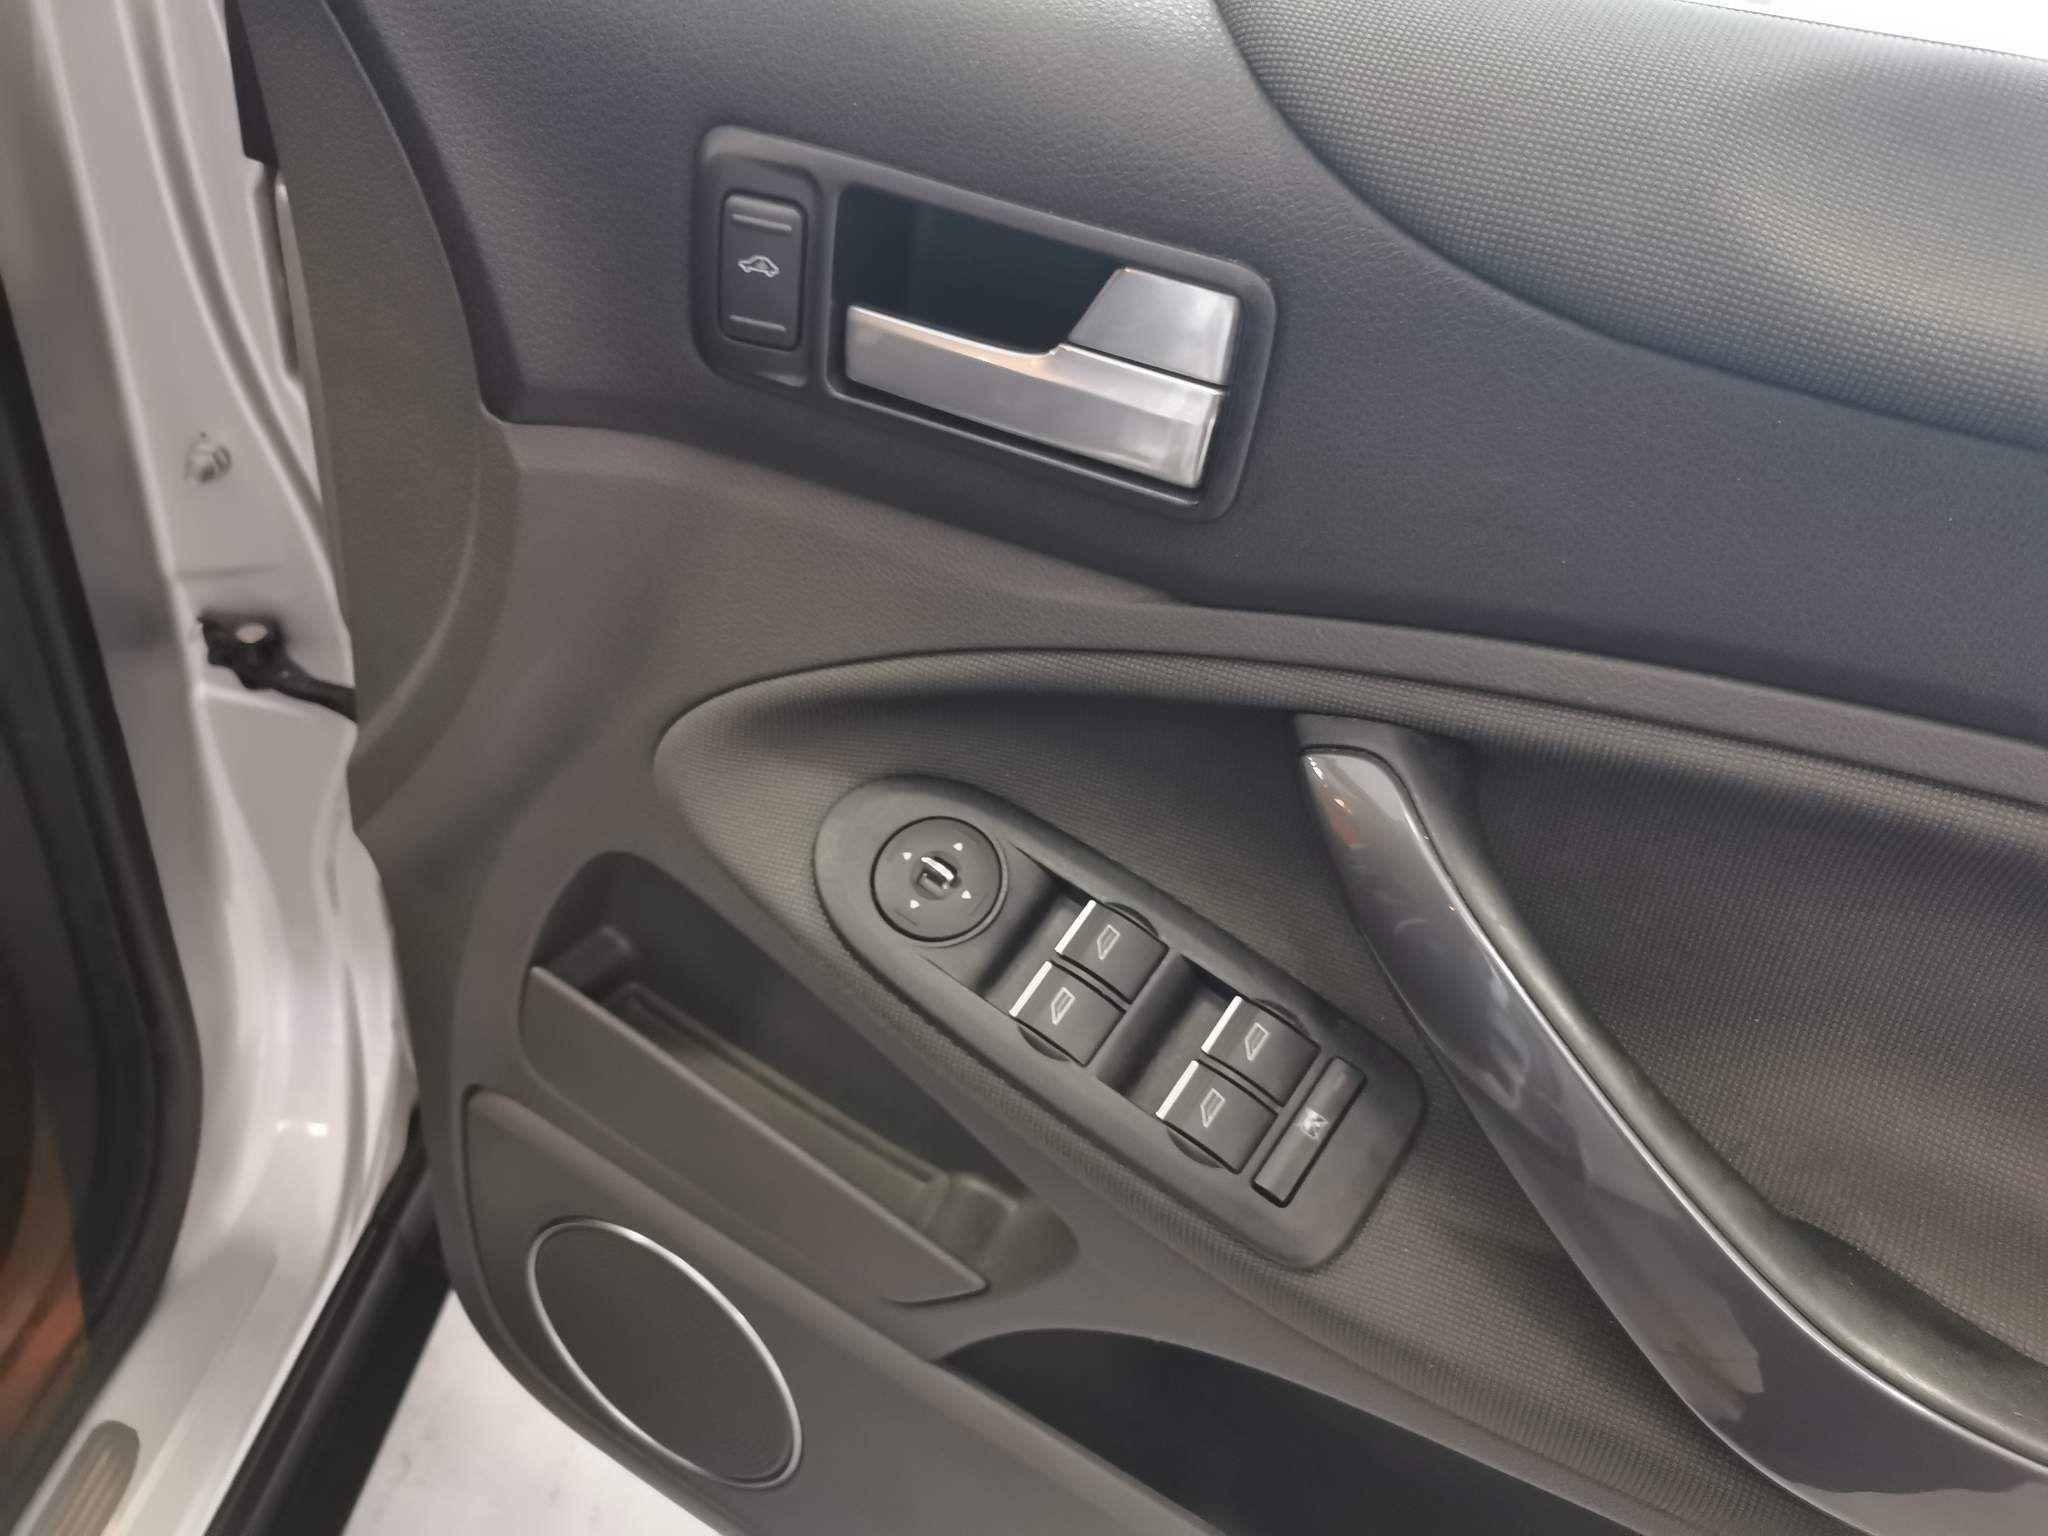 Ford Kuga Images